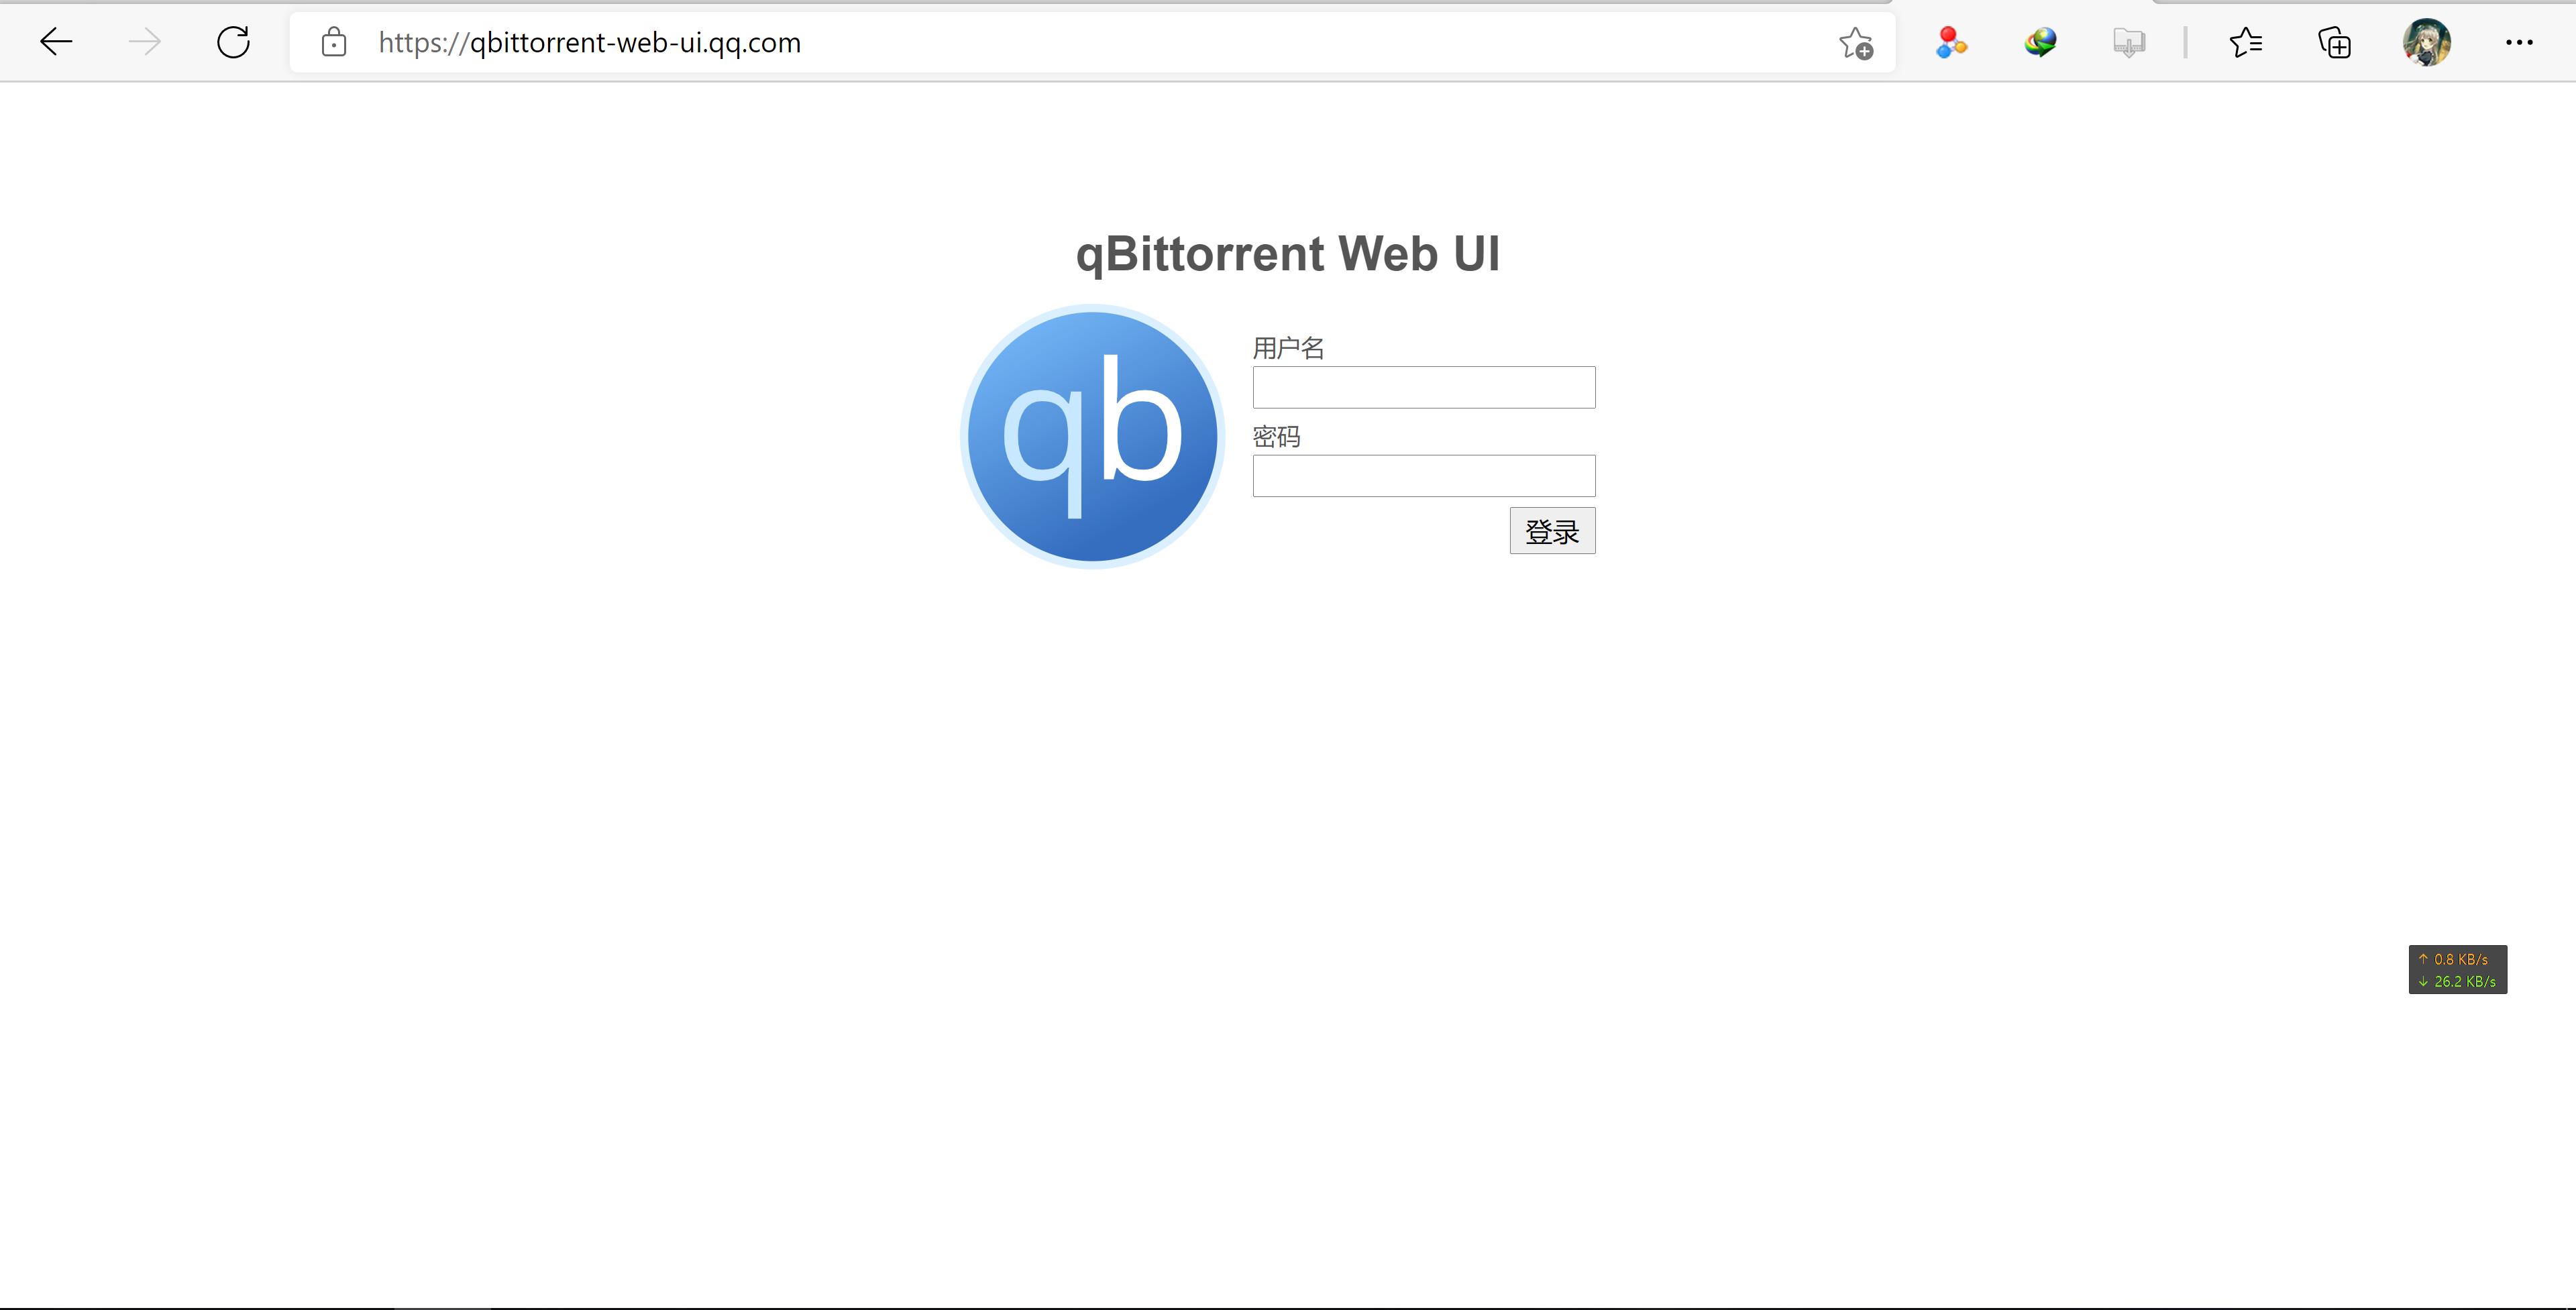 qcloud-Lighthouse-qBittorrent-WebUI-bt-effect